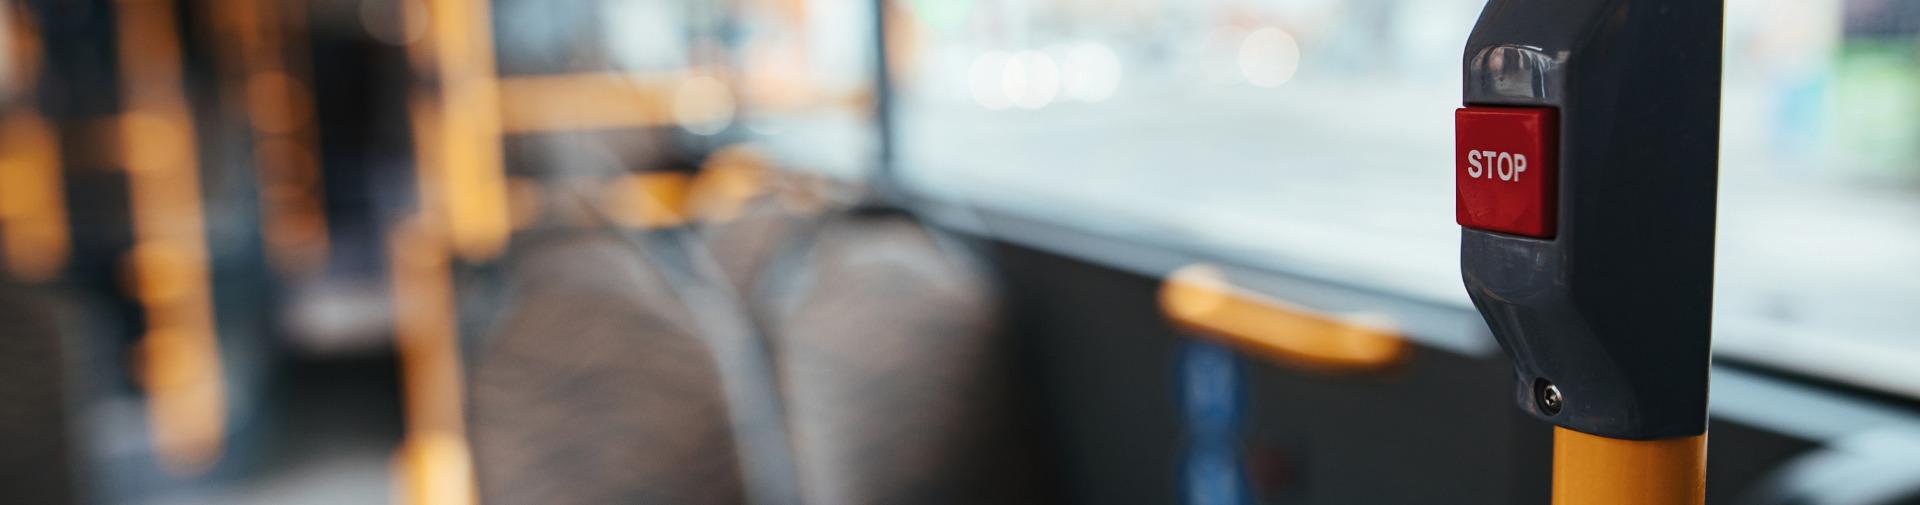 Bus Accident Compensation Claim Solicitors